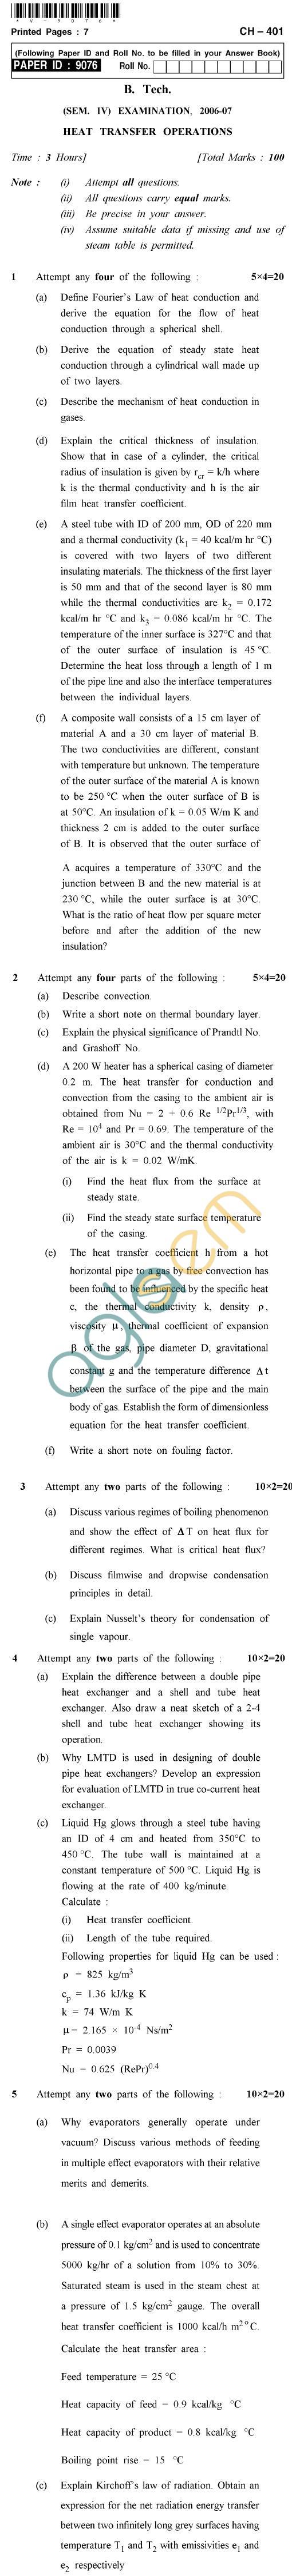 UPTU B.Tech Question Papers - CH-401 - Heat Transfer Operations